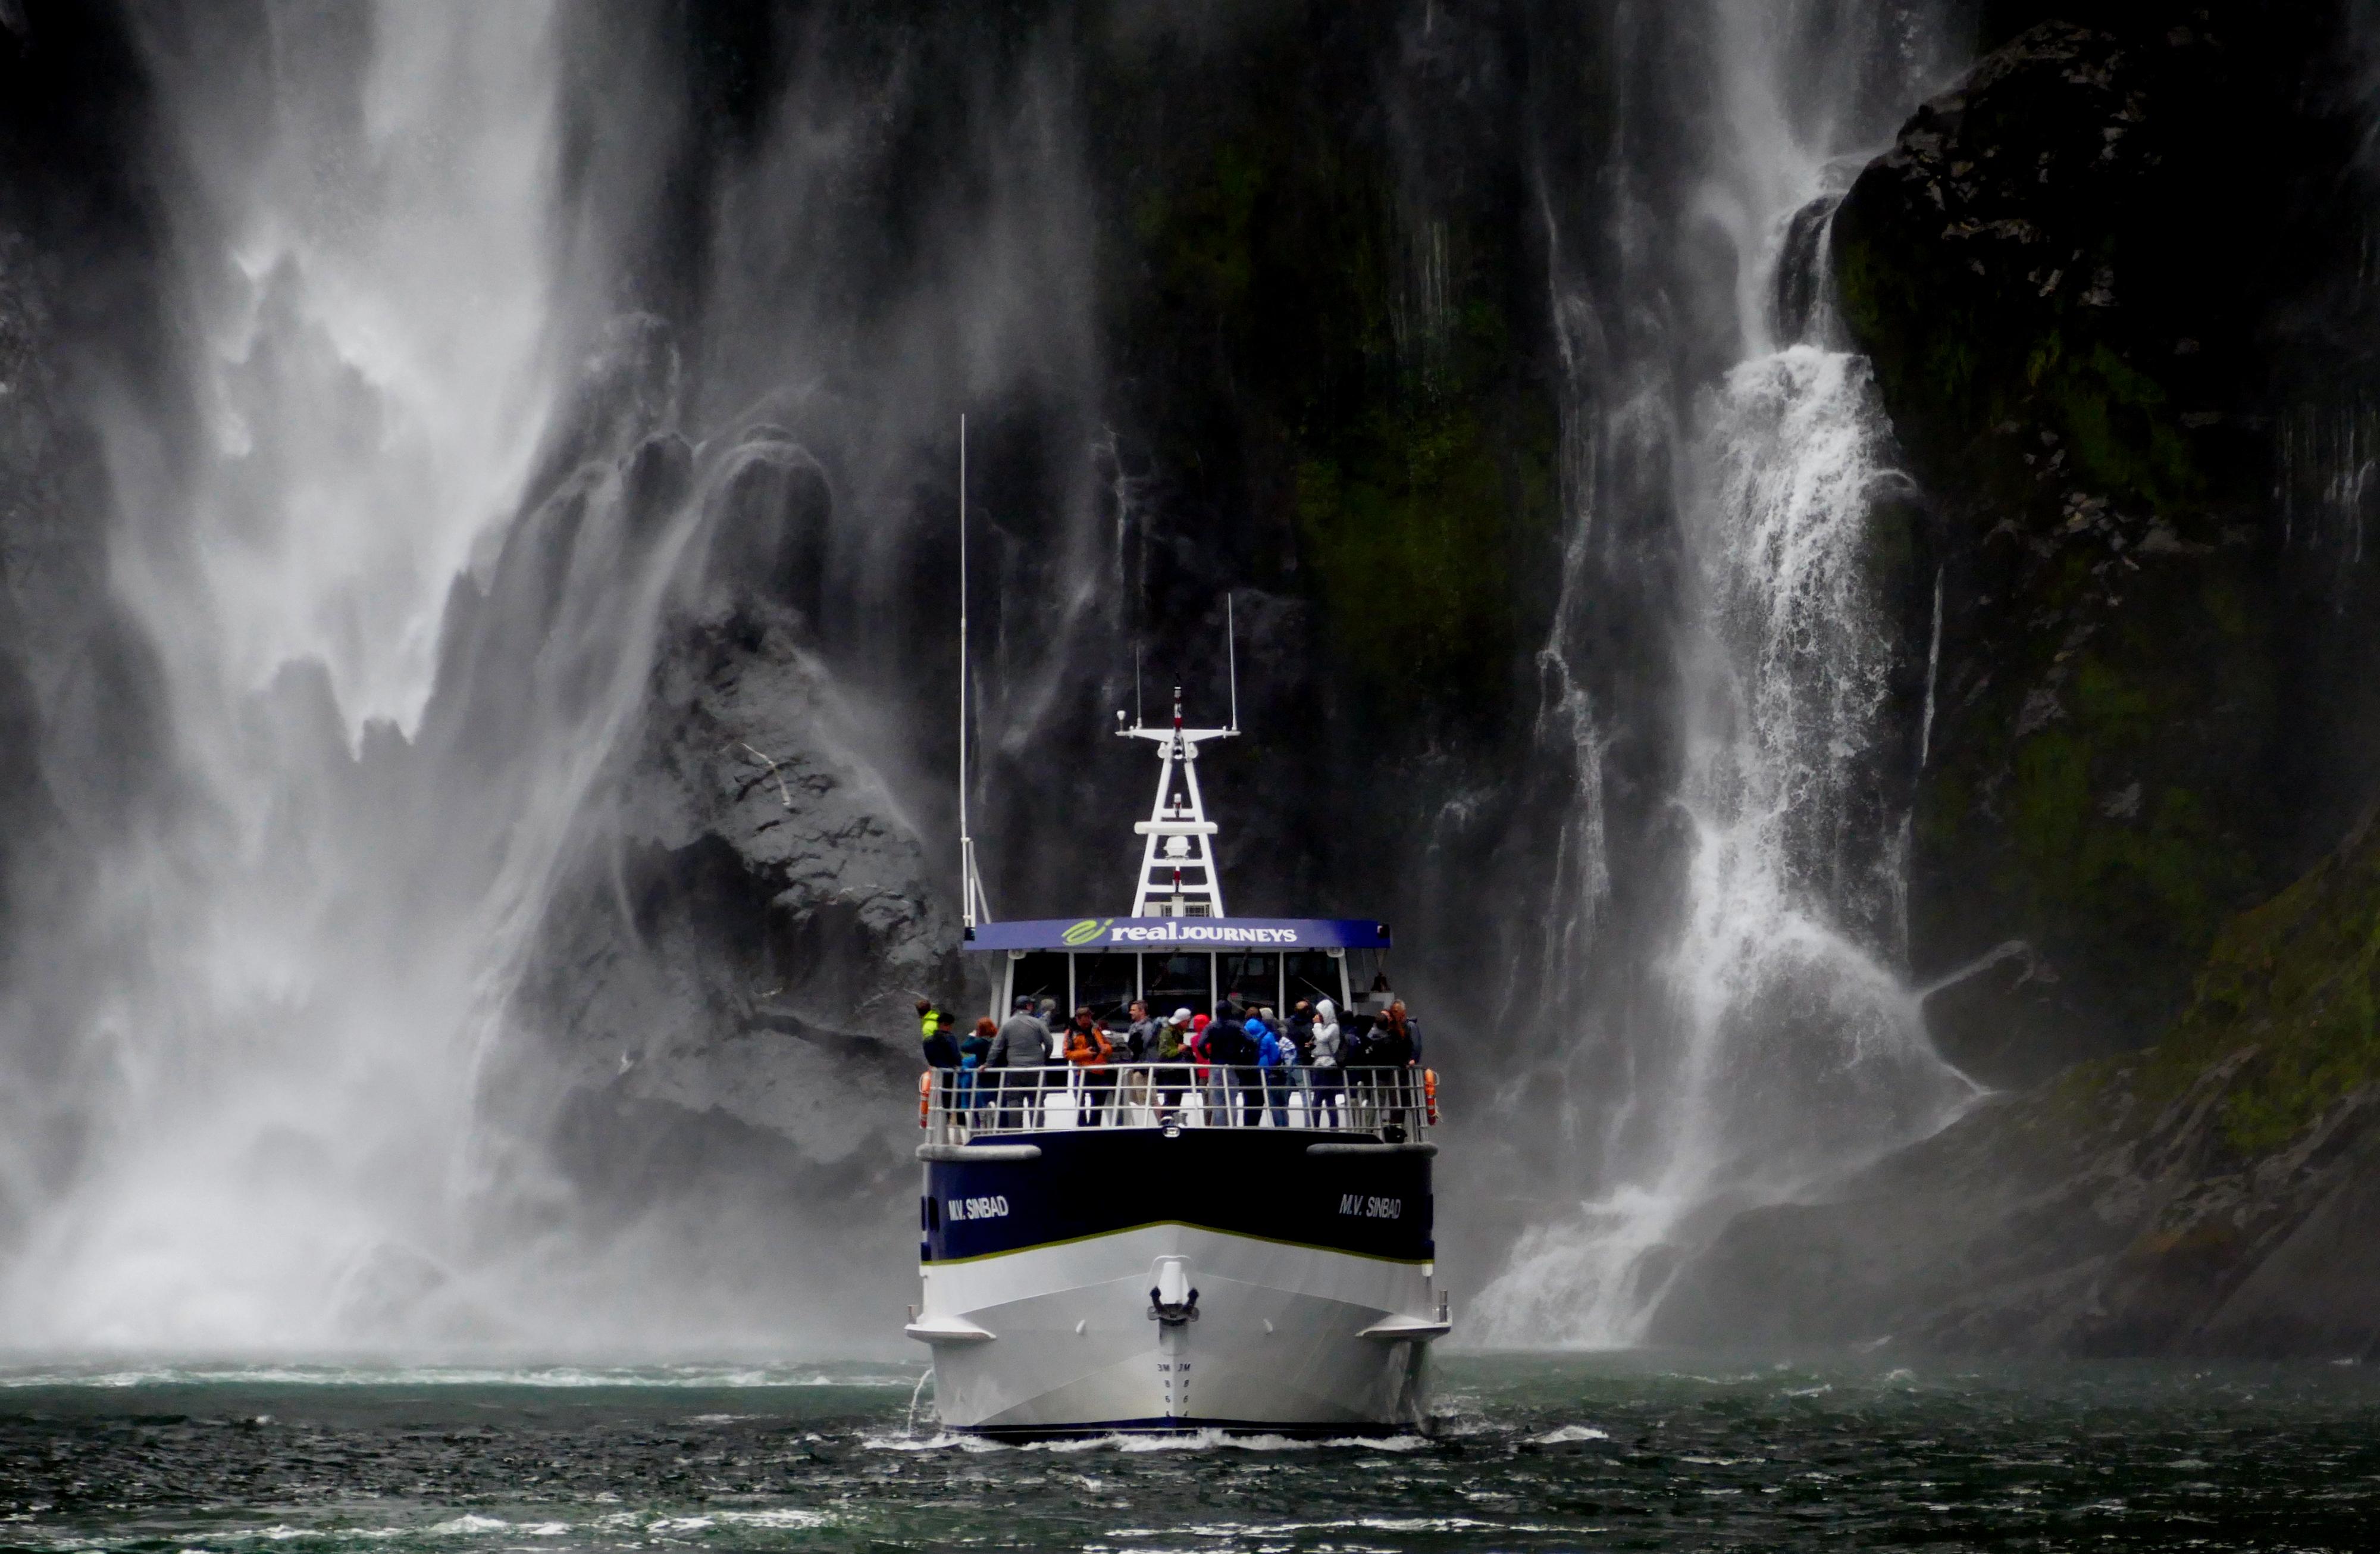 Under the bowen falls. milford sound. nz photo